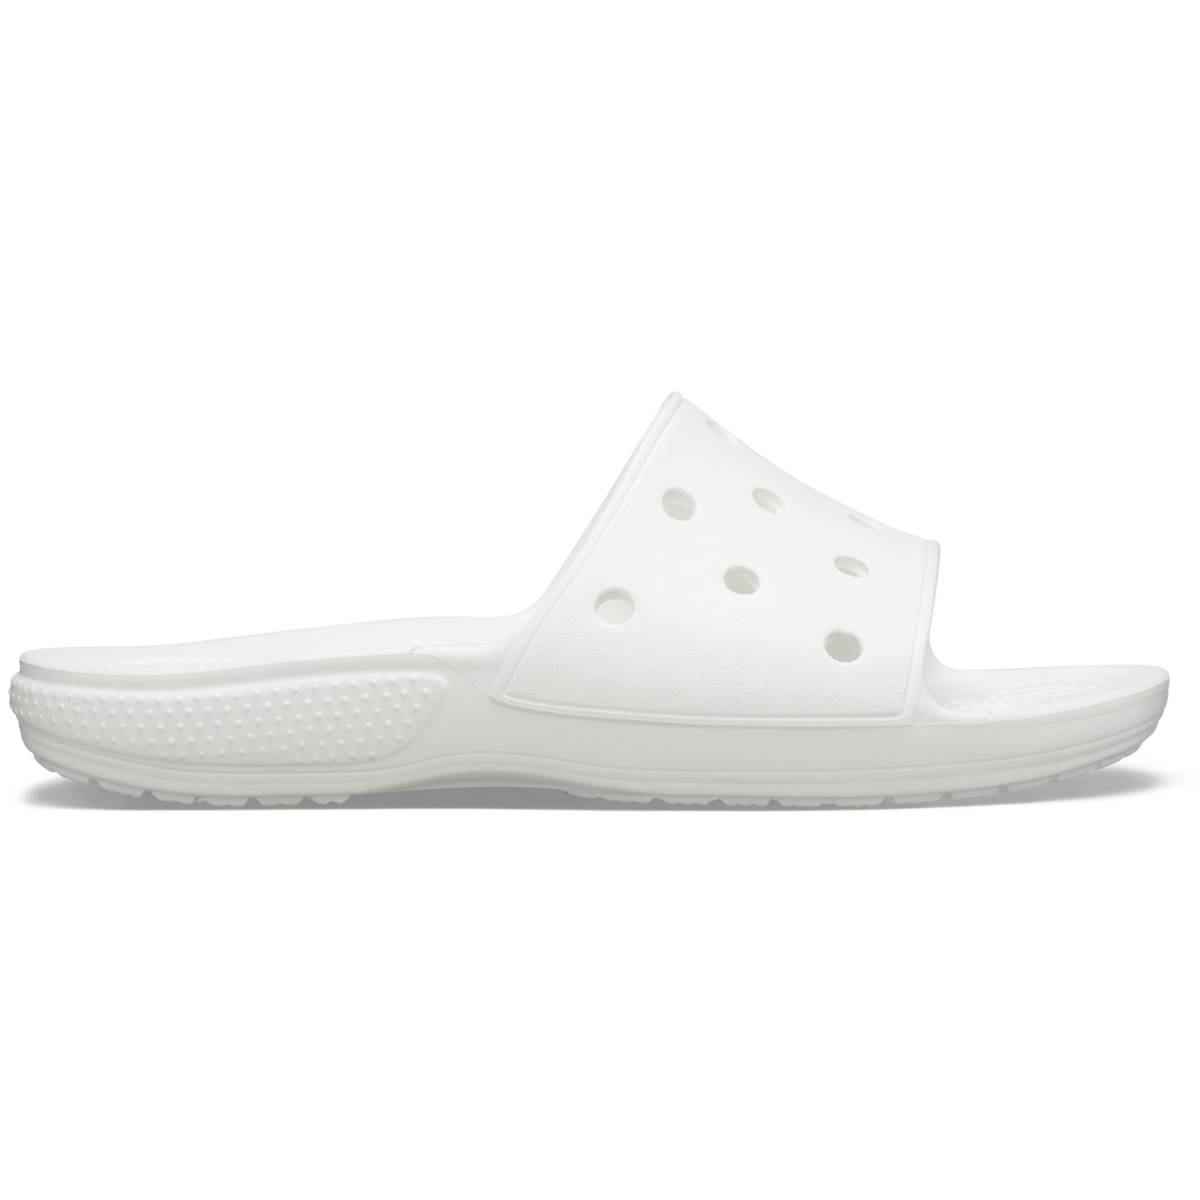 Classic Crocs Slide - White